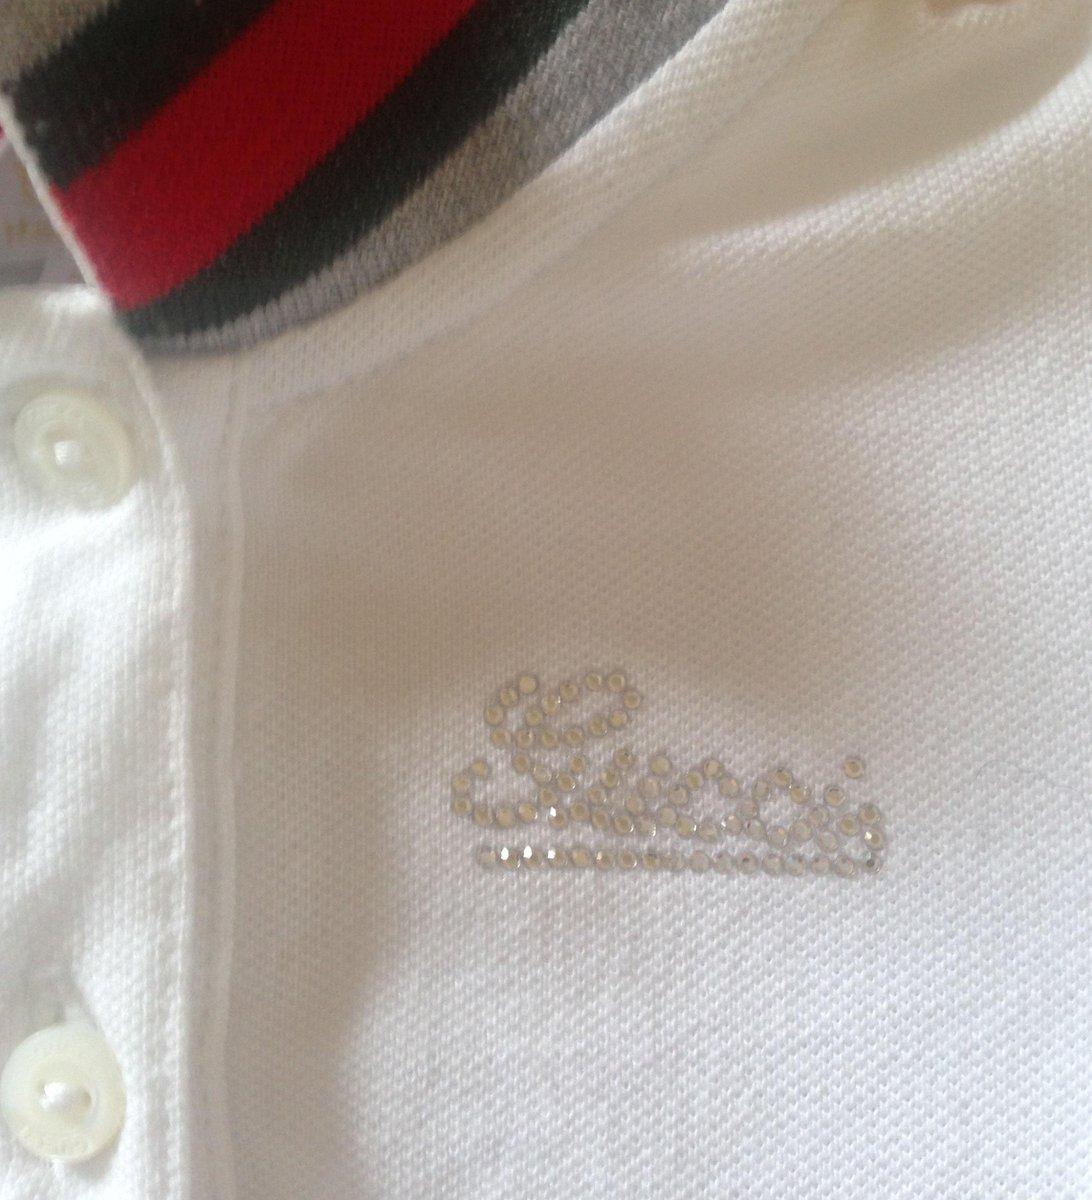 CL_KXzcWoAA4U8a ralph lauren baby clothes ebay uk aeronet seo co uk,Childrens Clothes Ebay Uk